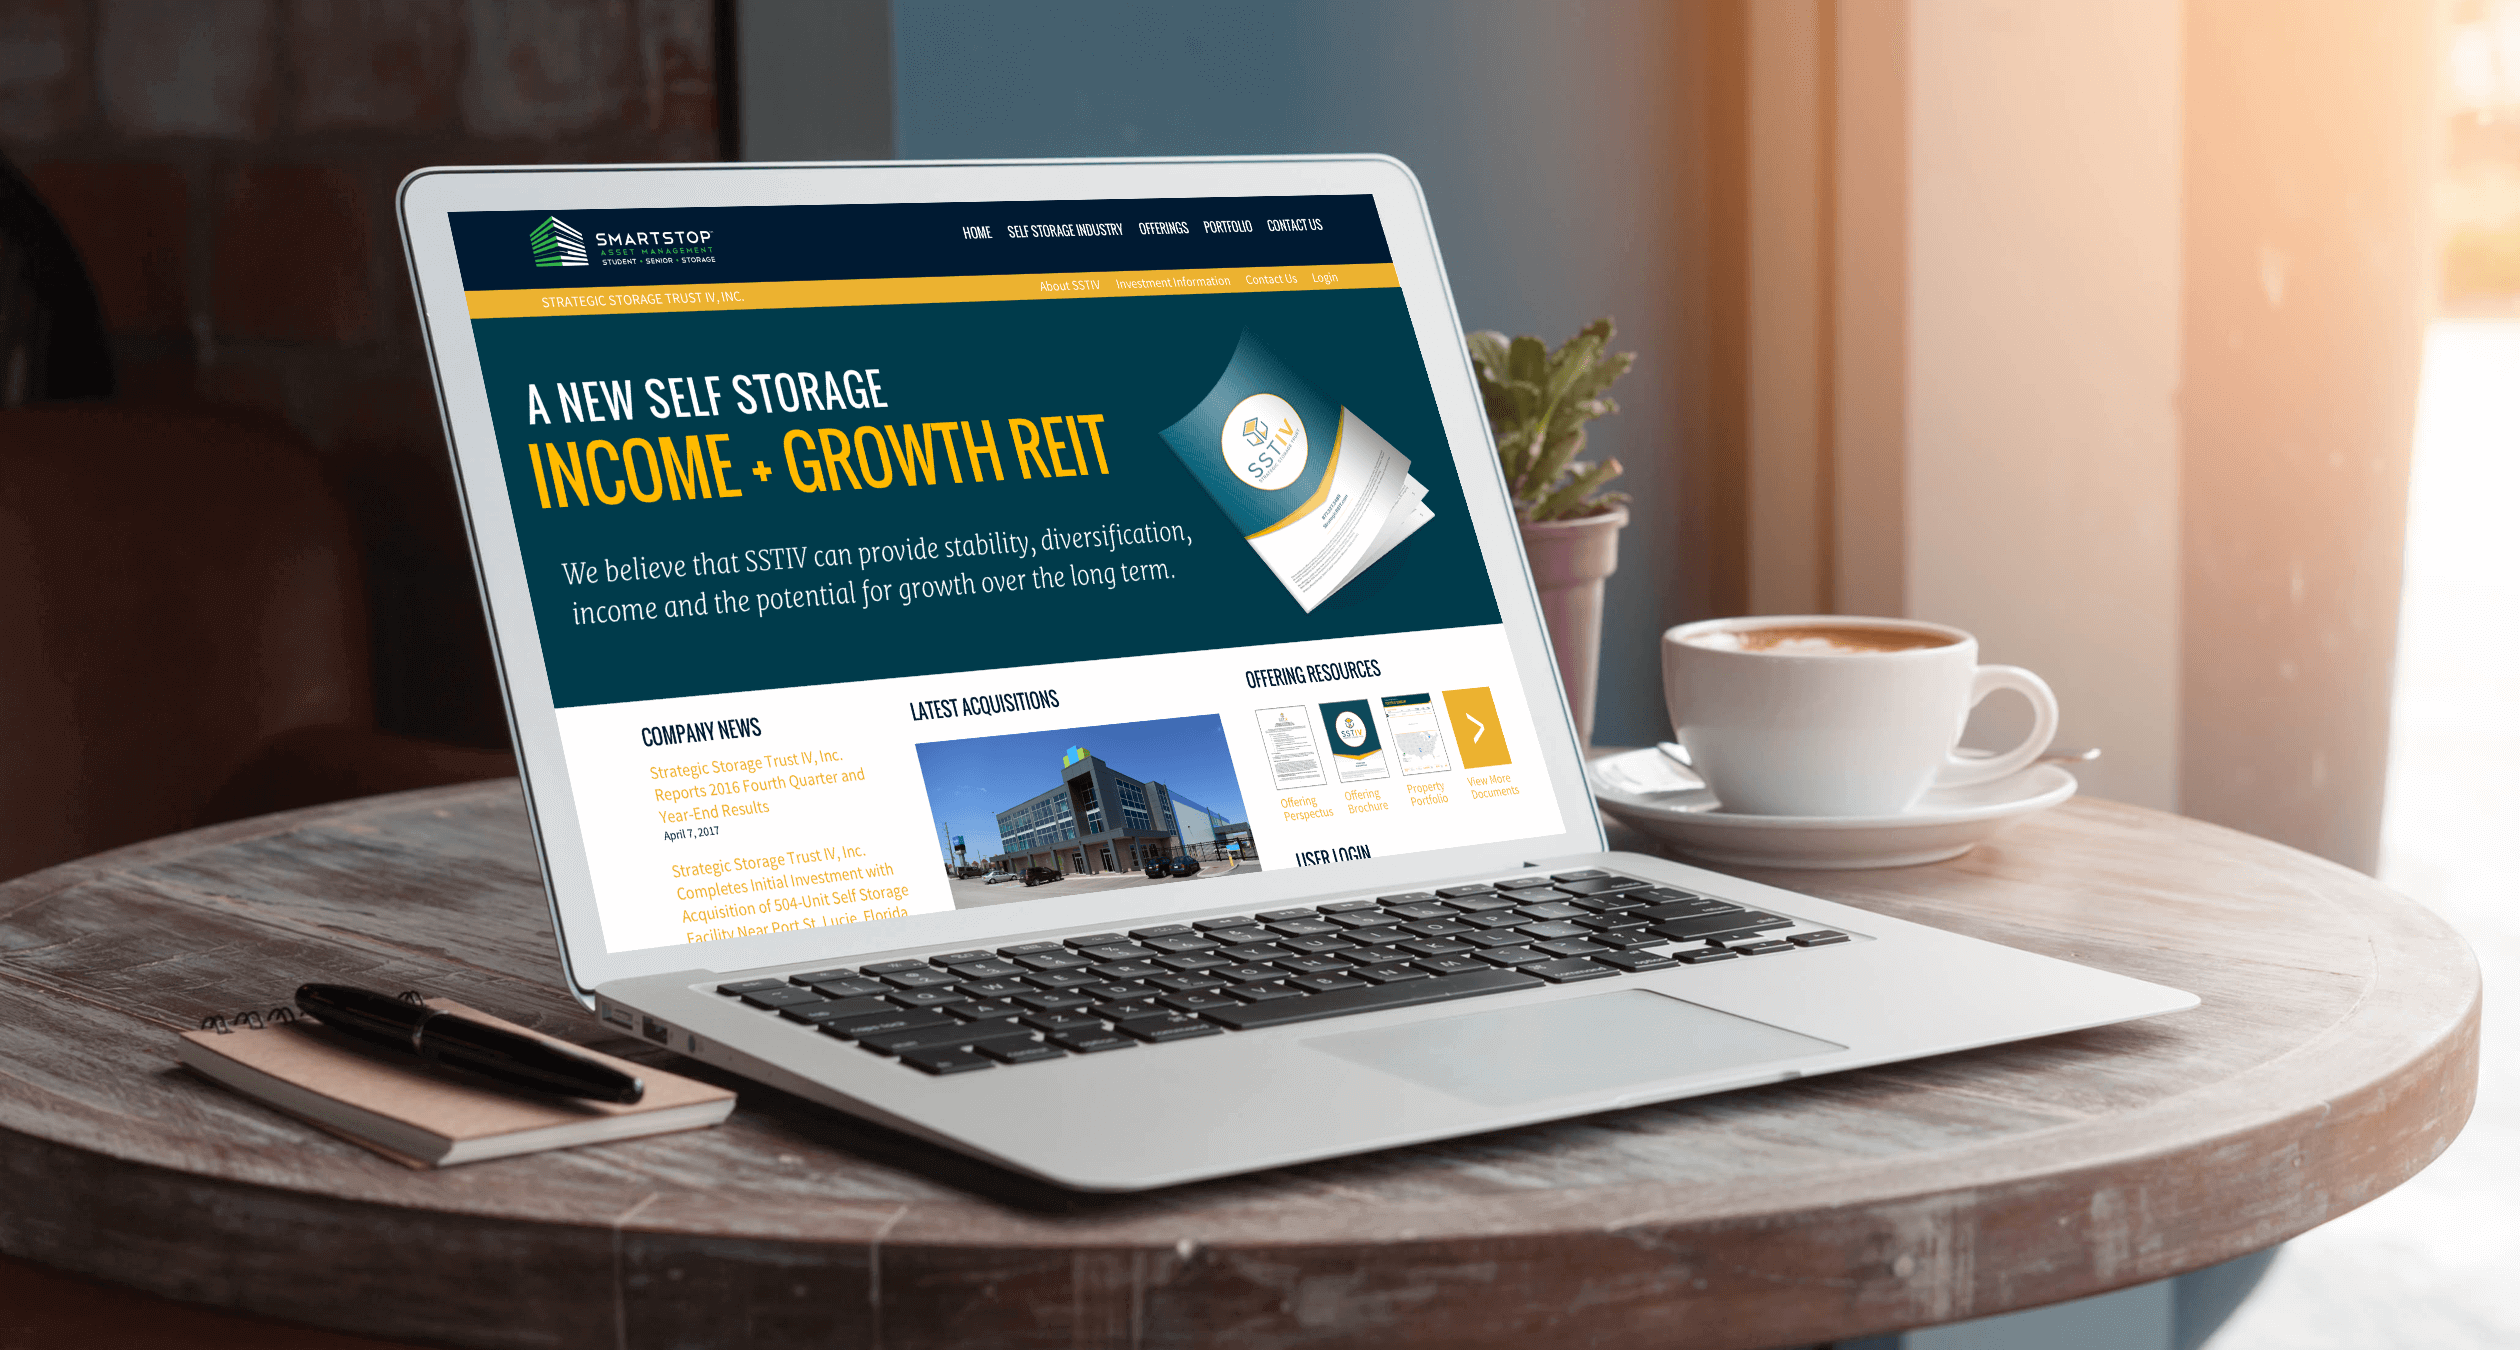 Strategic-REIT-Website-Design-REIT-and-1031-Exchange-Real-Estate-Investment-Trust-Home